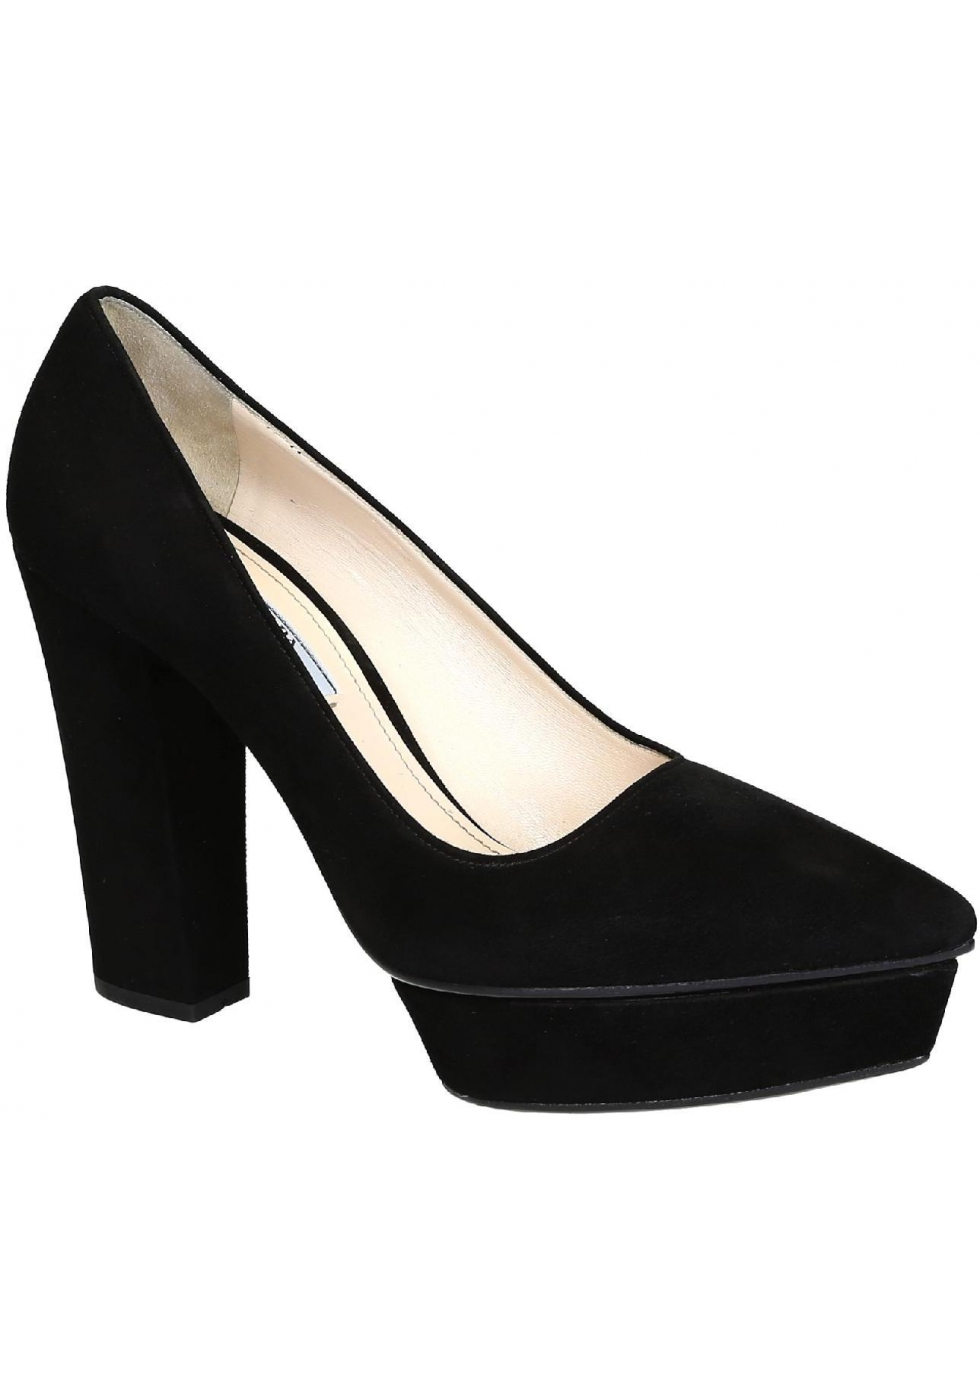 21761cbc1546 Prada pumps with platform in black suede leather - Italian Boutique